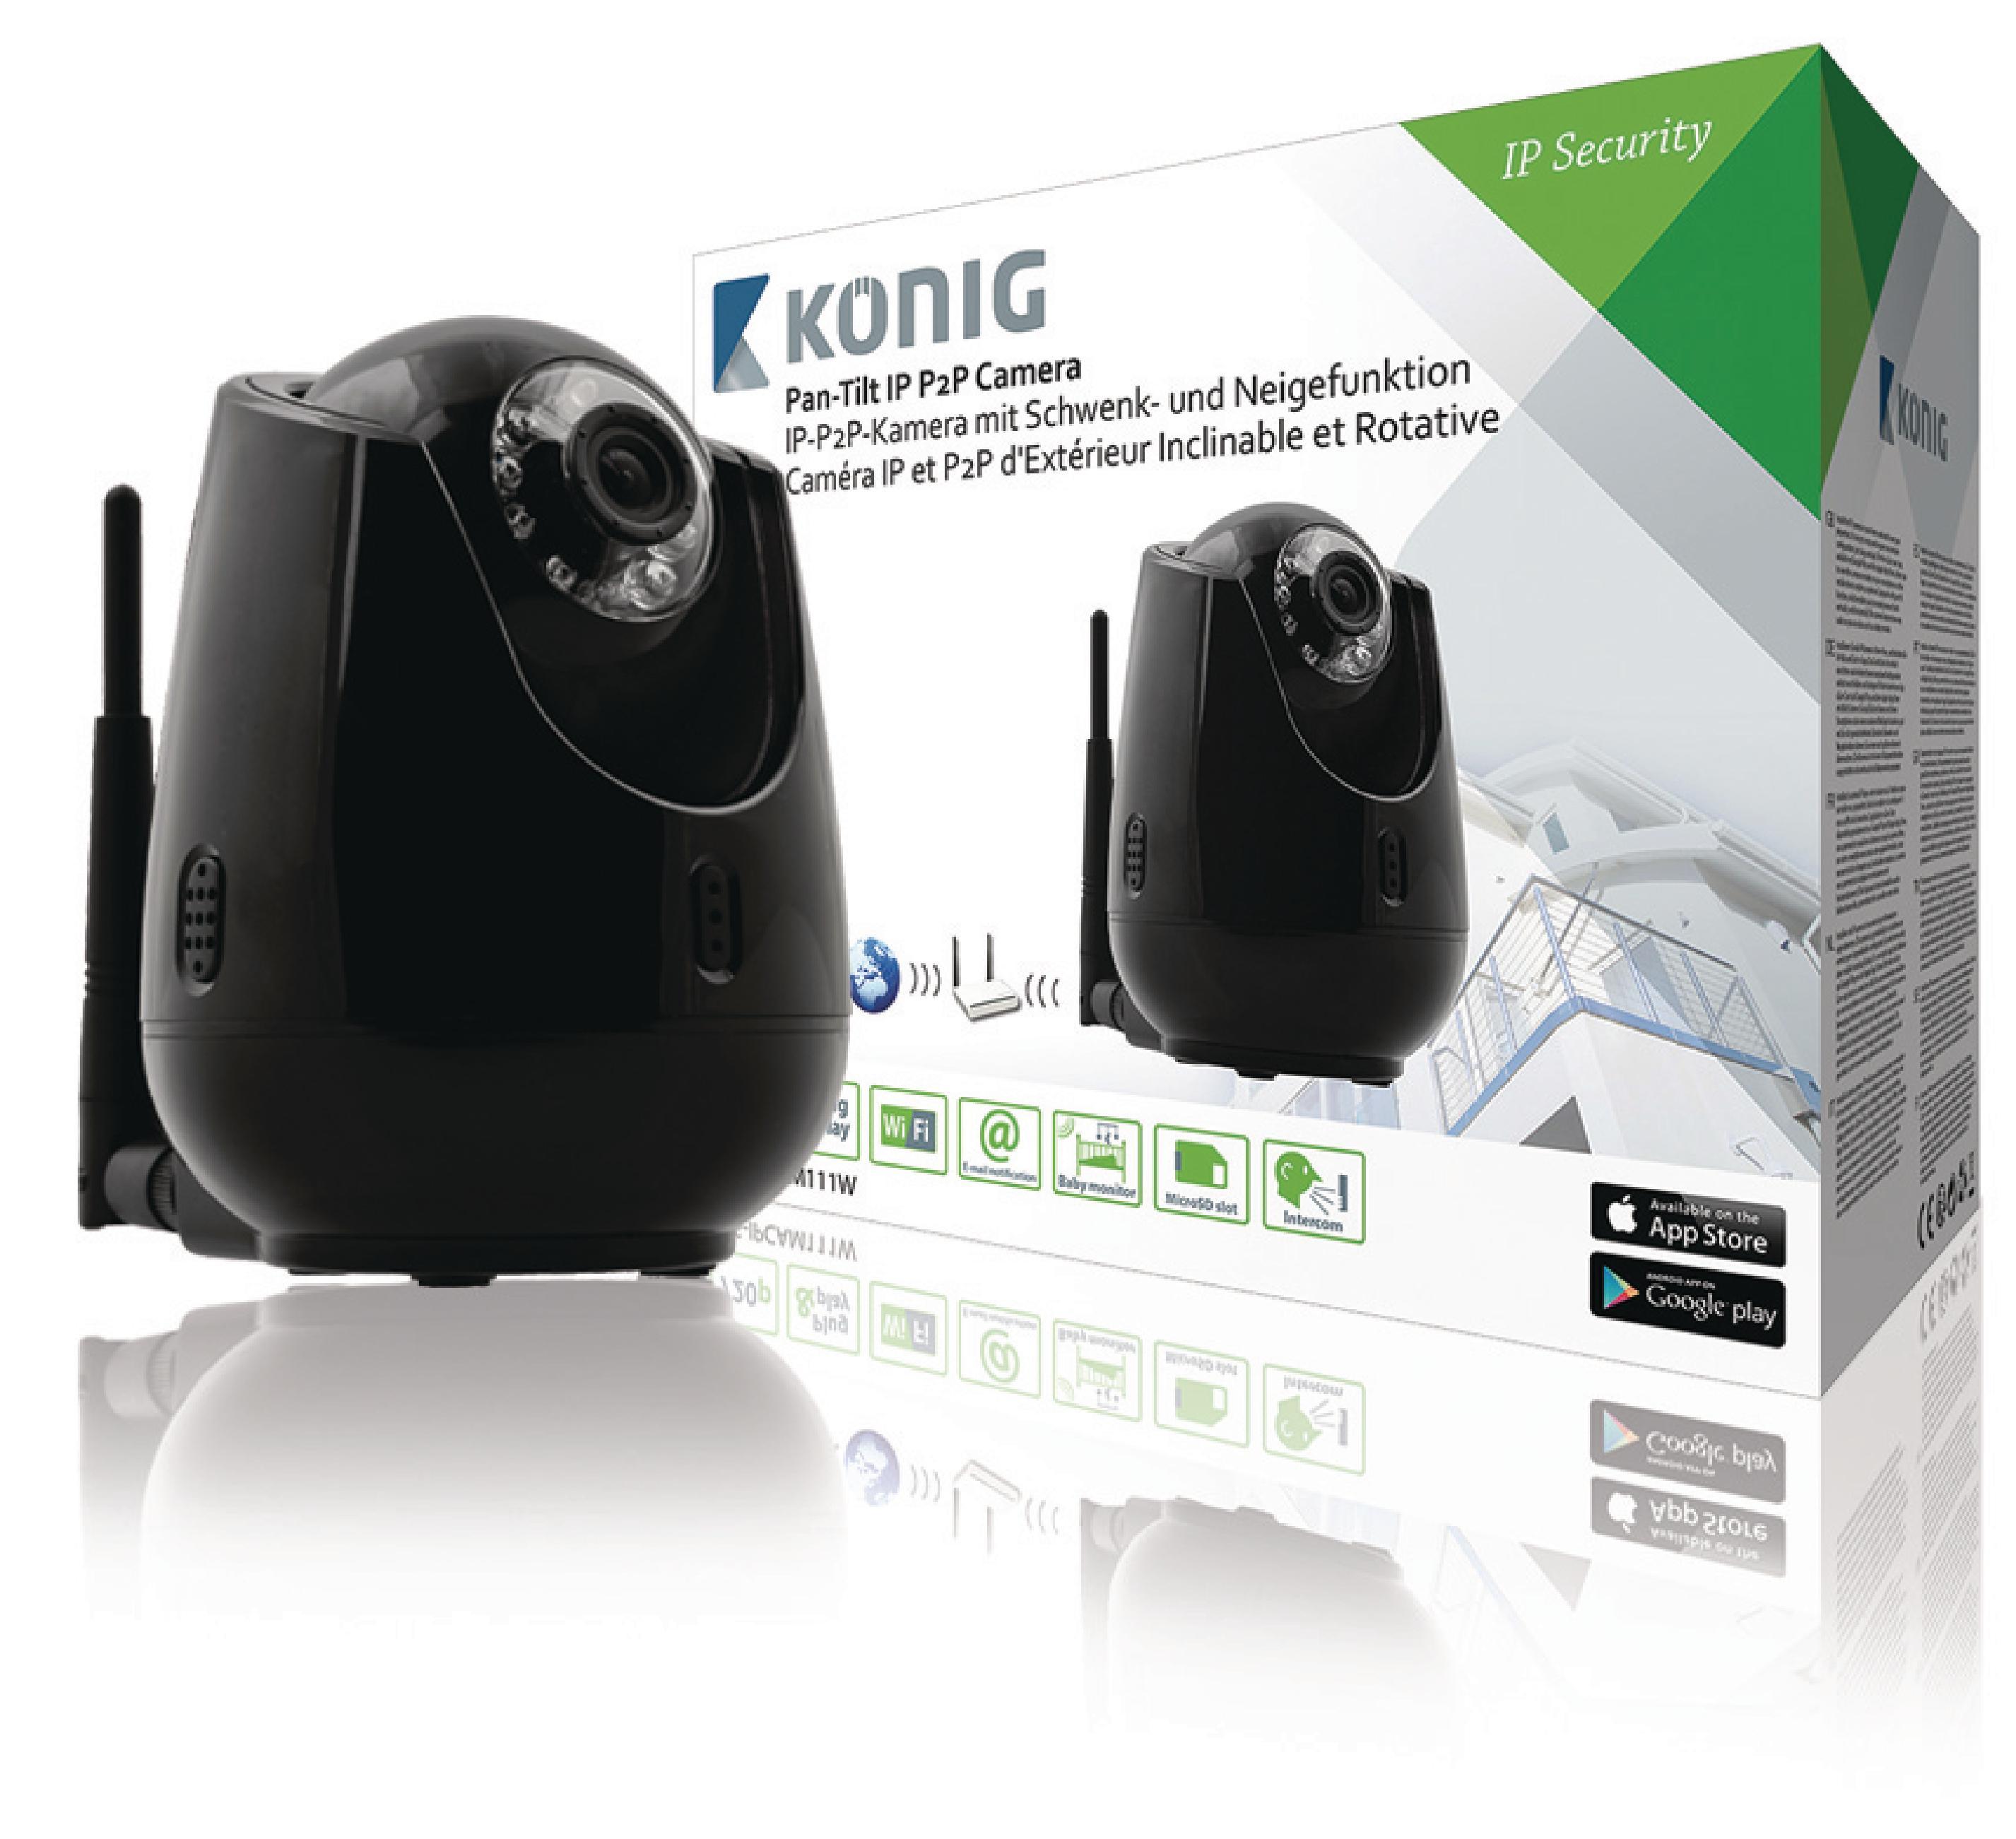 HD Caméra De Surveillance IP Pan Tilt Intérieur 720P Noir